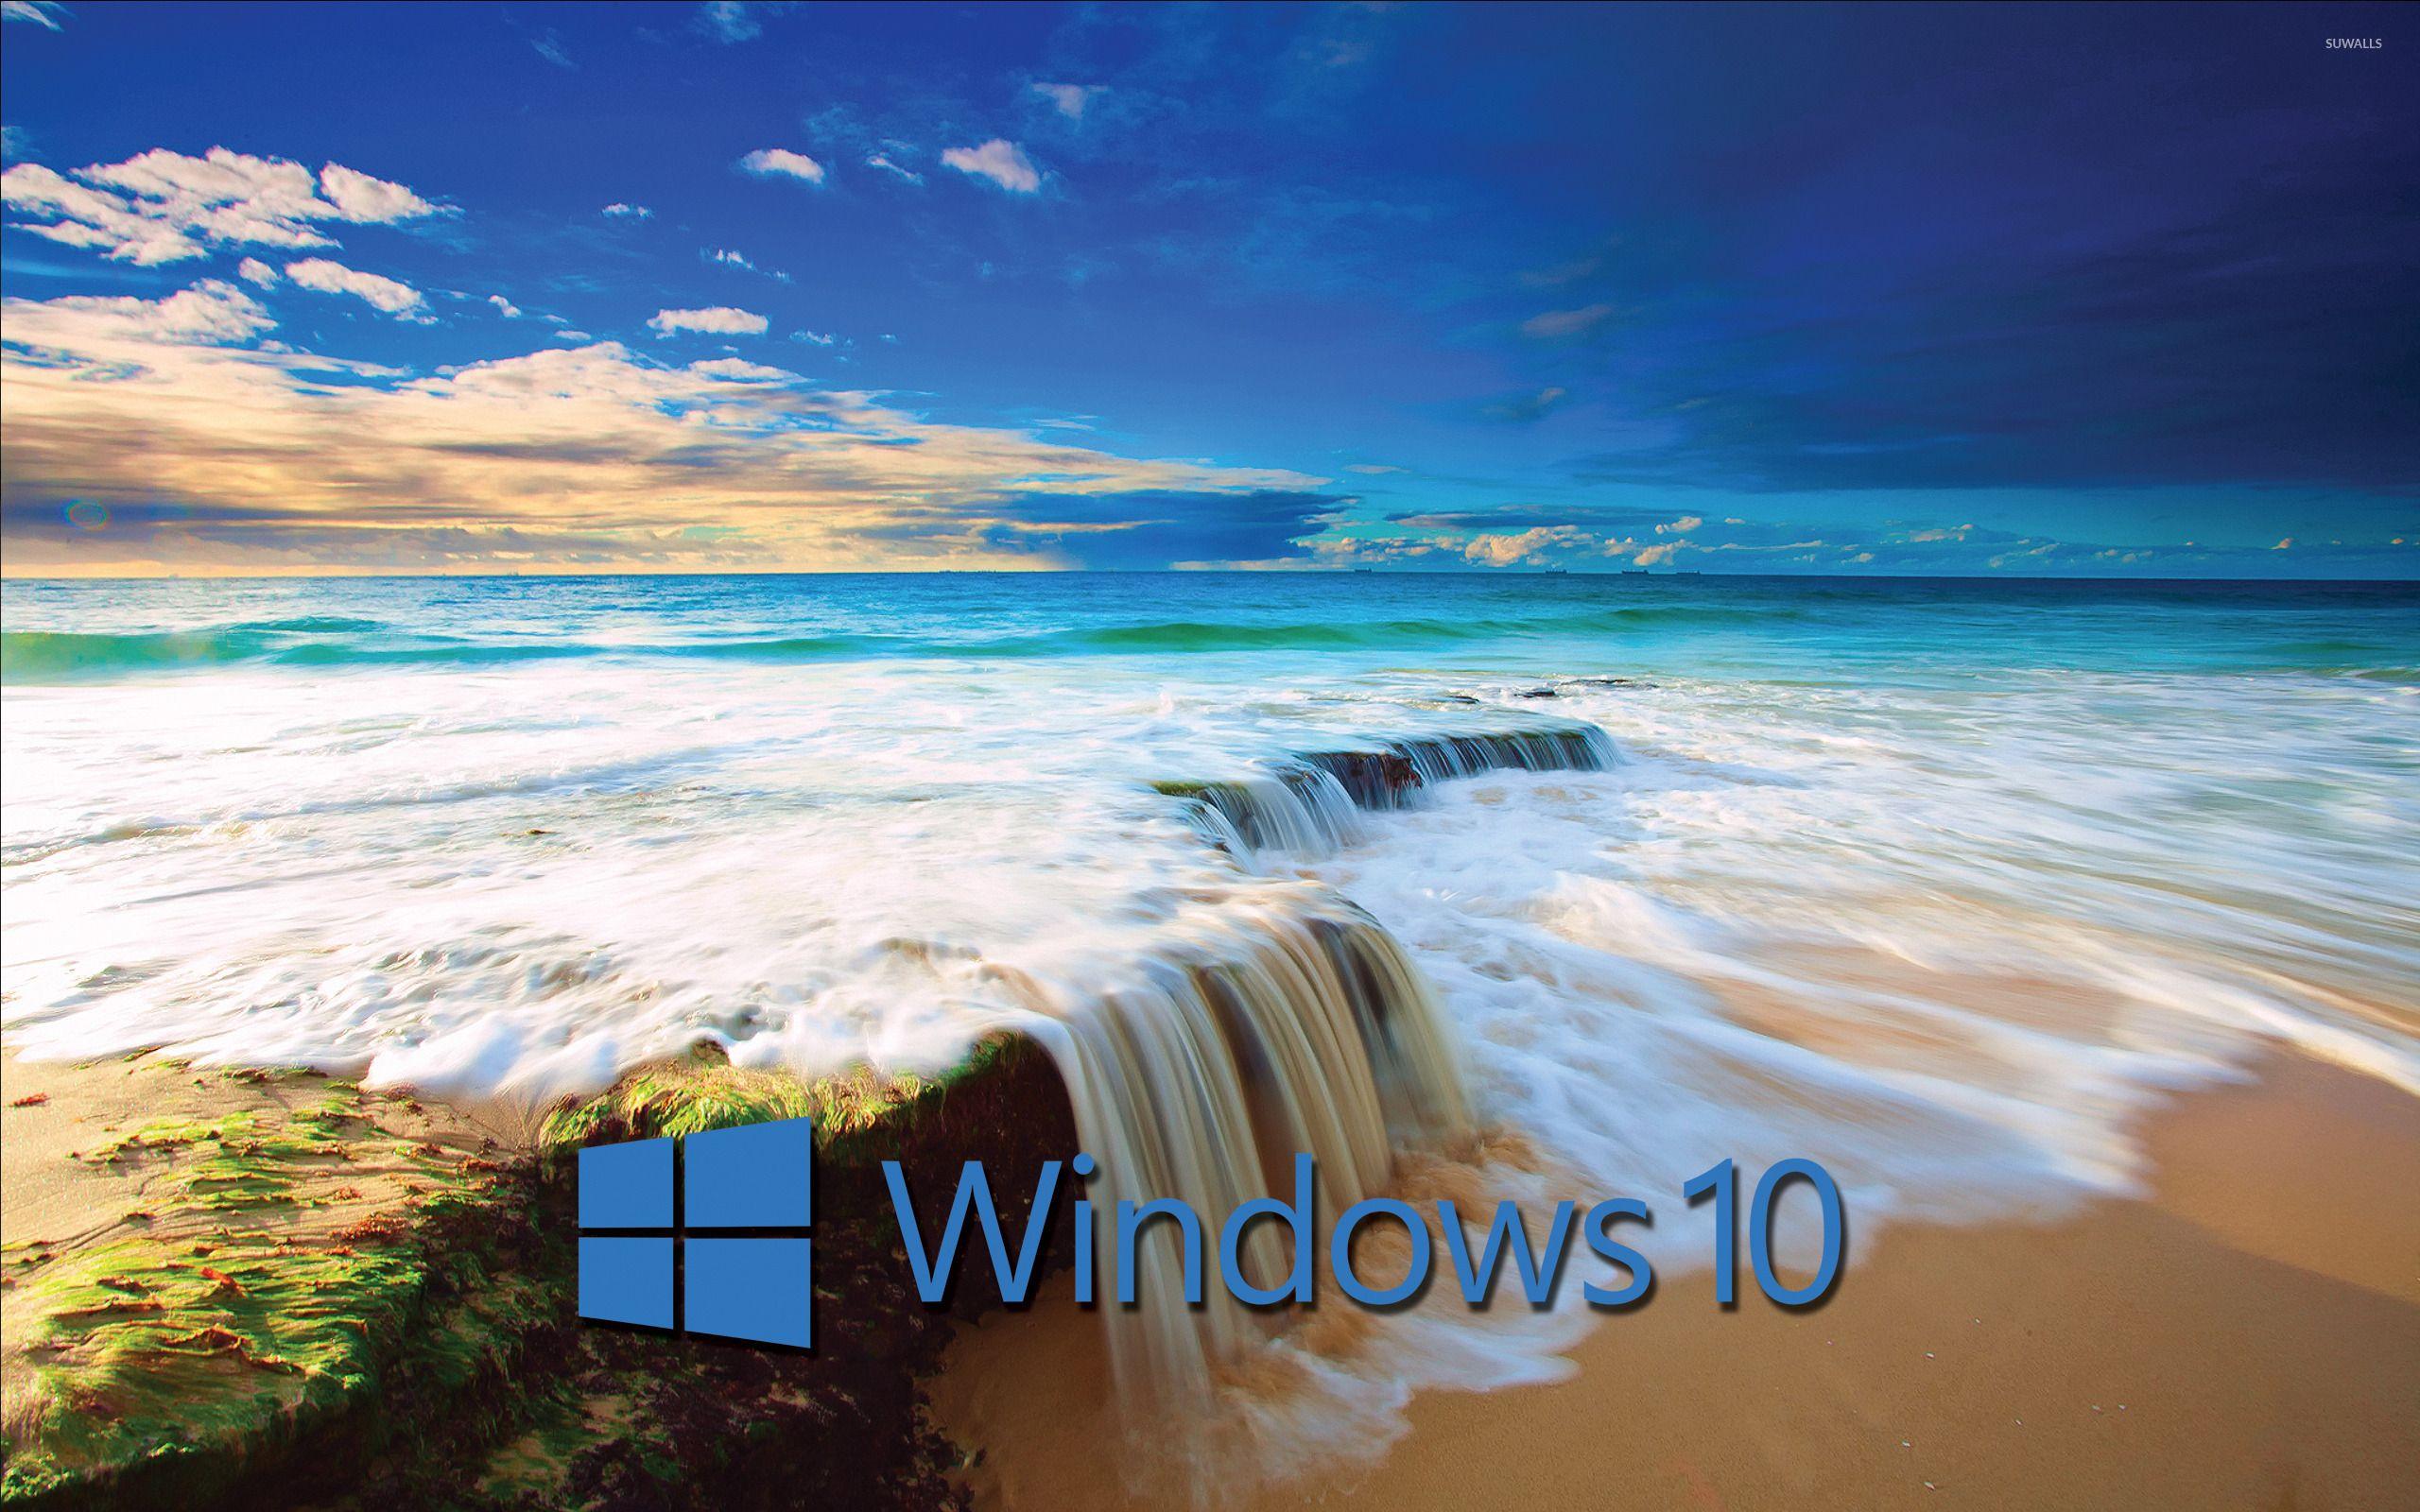 Windows 10 Wallpaper Beach Mywallpapers Site Beautiful Wallpaper Images Summer Beach Wallpaper Beach Wallpaper